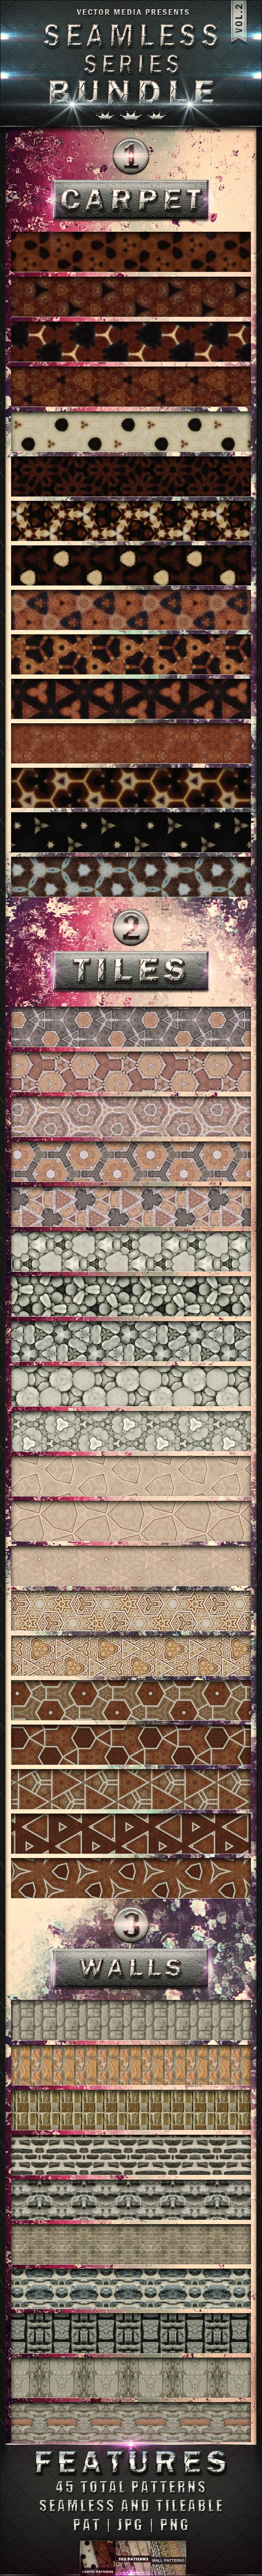 Seamless Series - Bundle Vol.2 - Textures / Fills / Patterns Photoshop